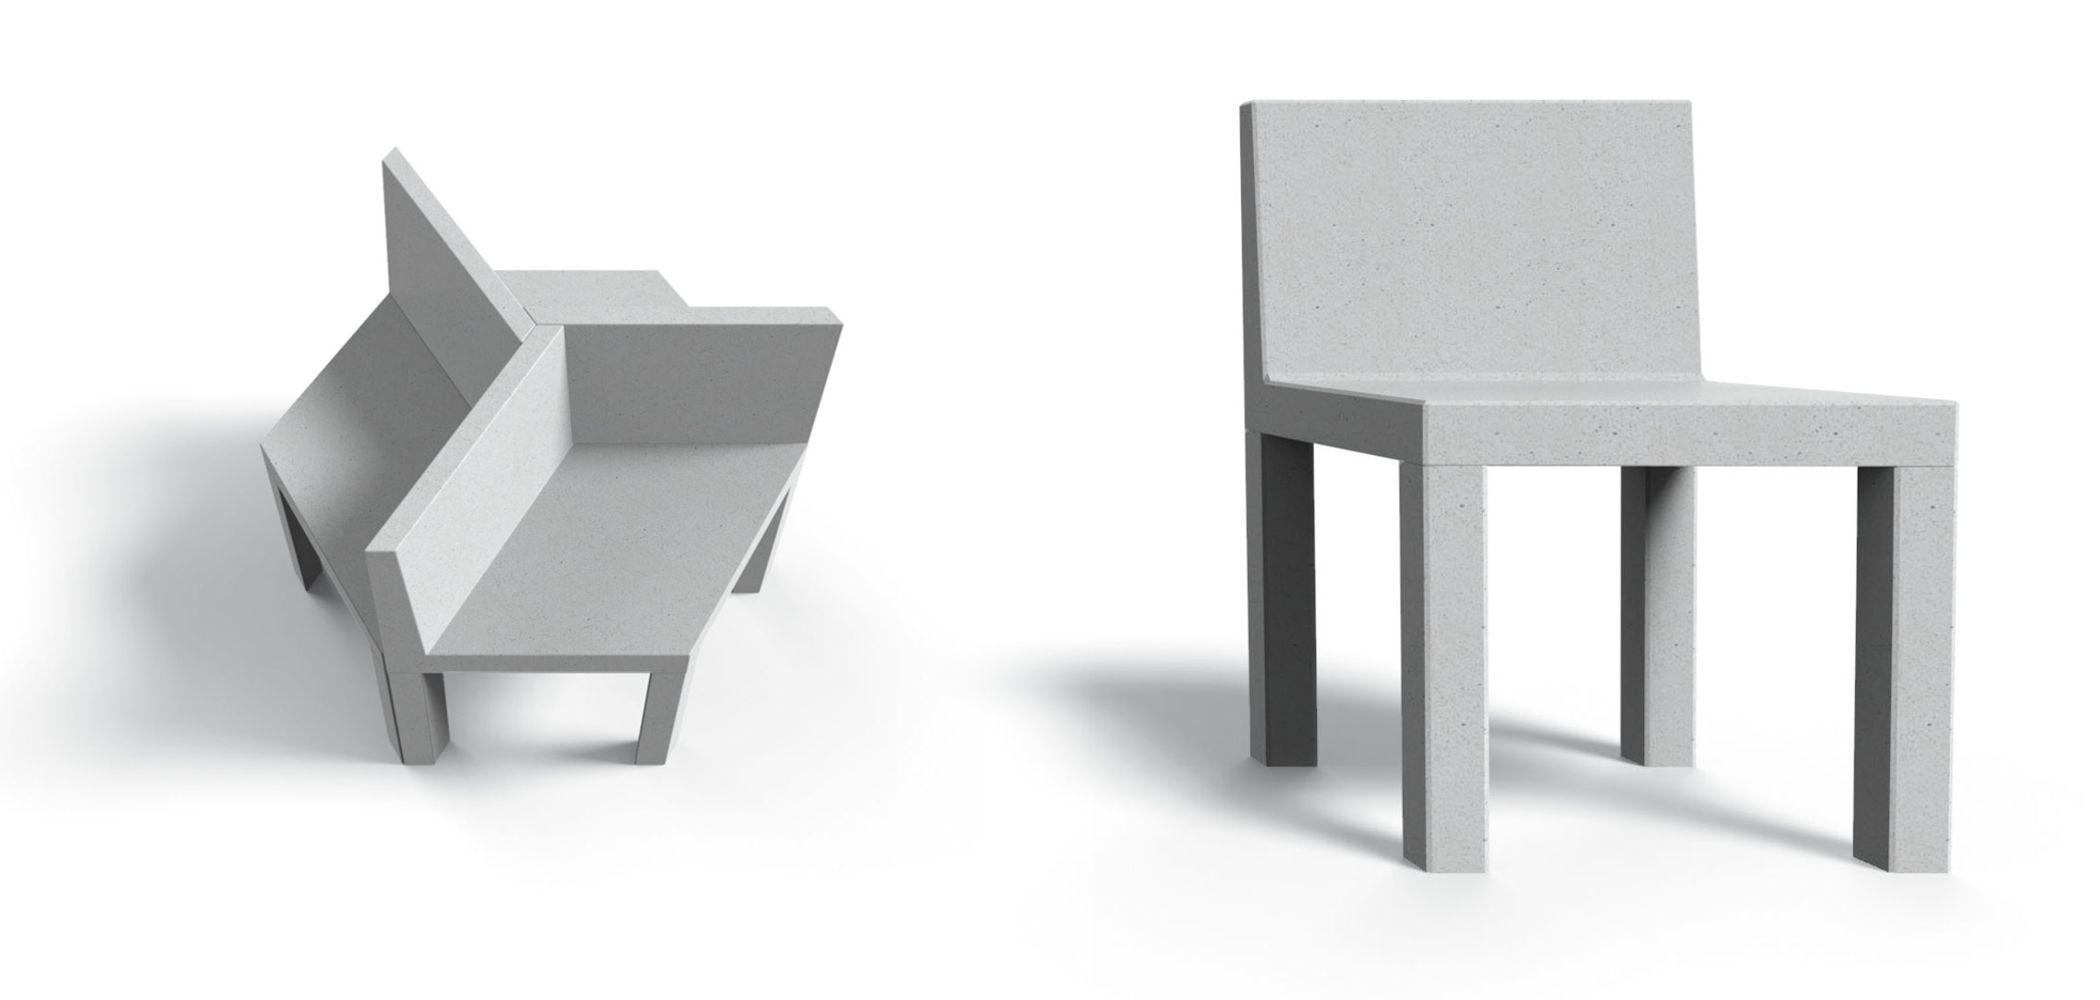 Giulio Iacchetti, Isometrica, Metalco